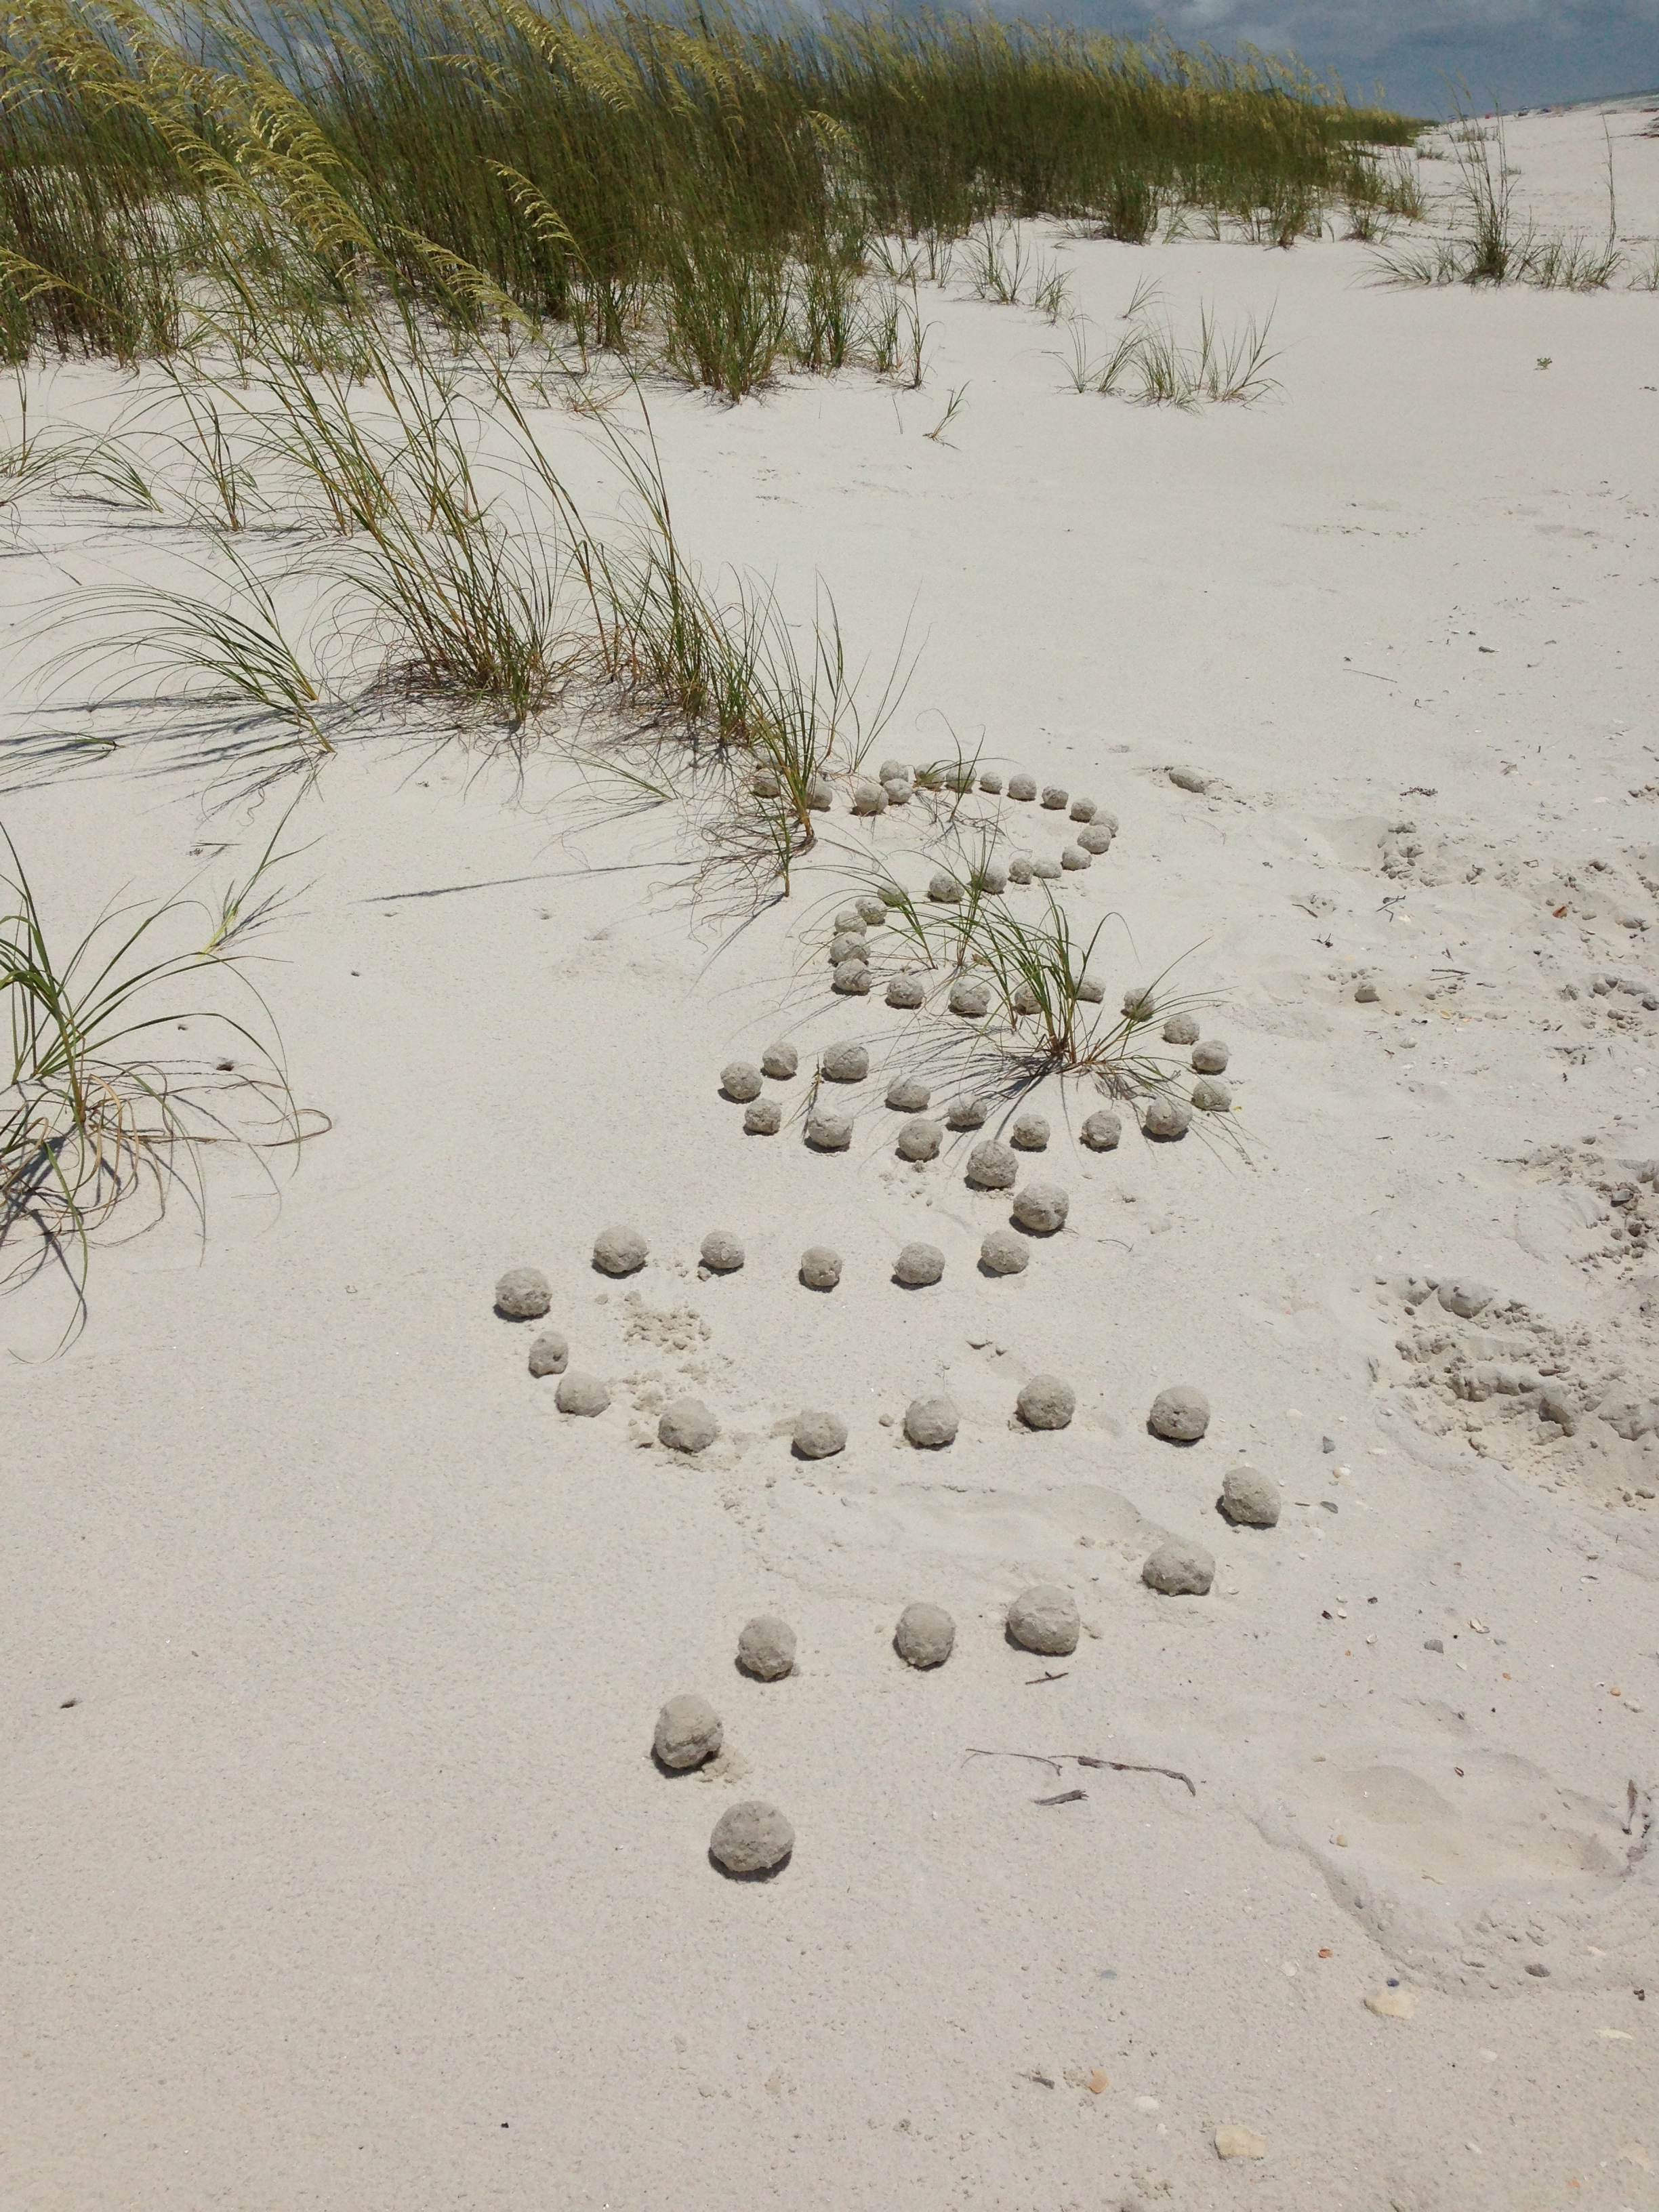 Sand balls on dune. Cape St. San Blas, FL. Summer 2013.